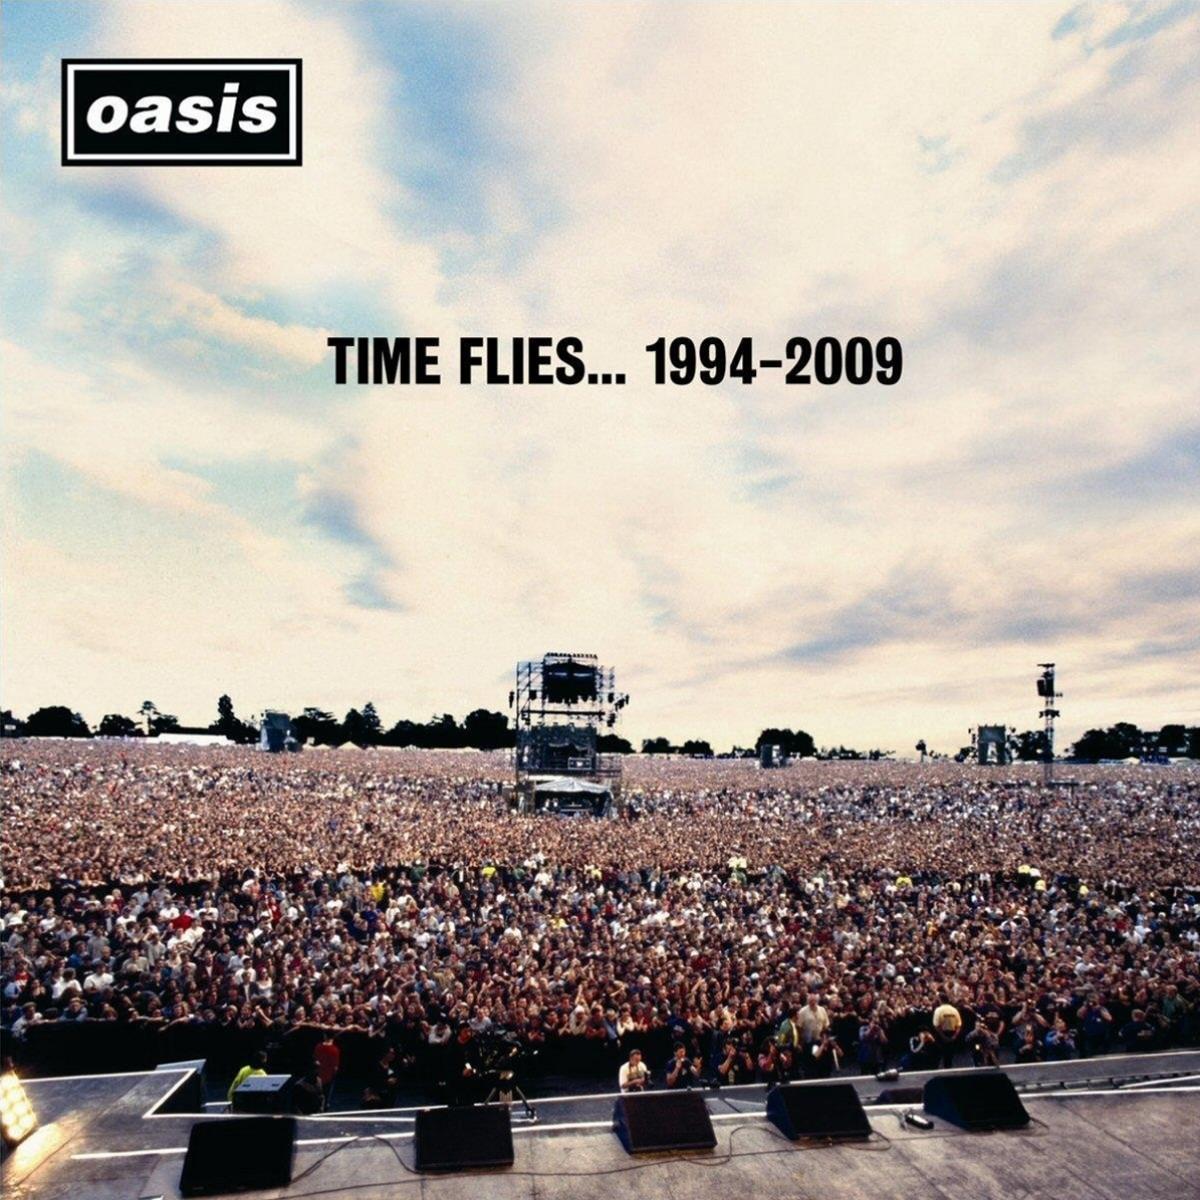 TIME FLIES - 1994-2009